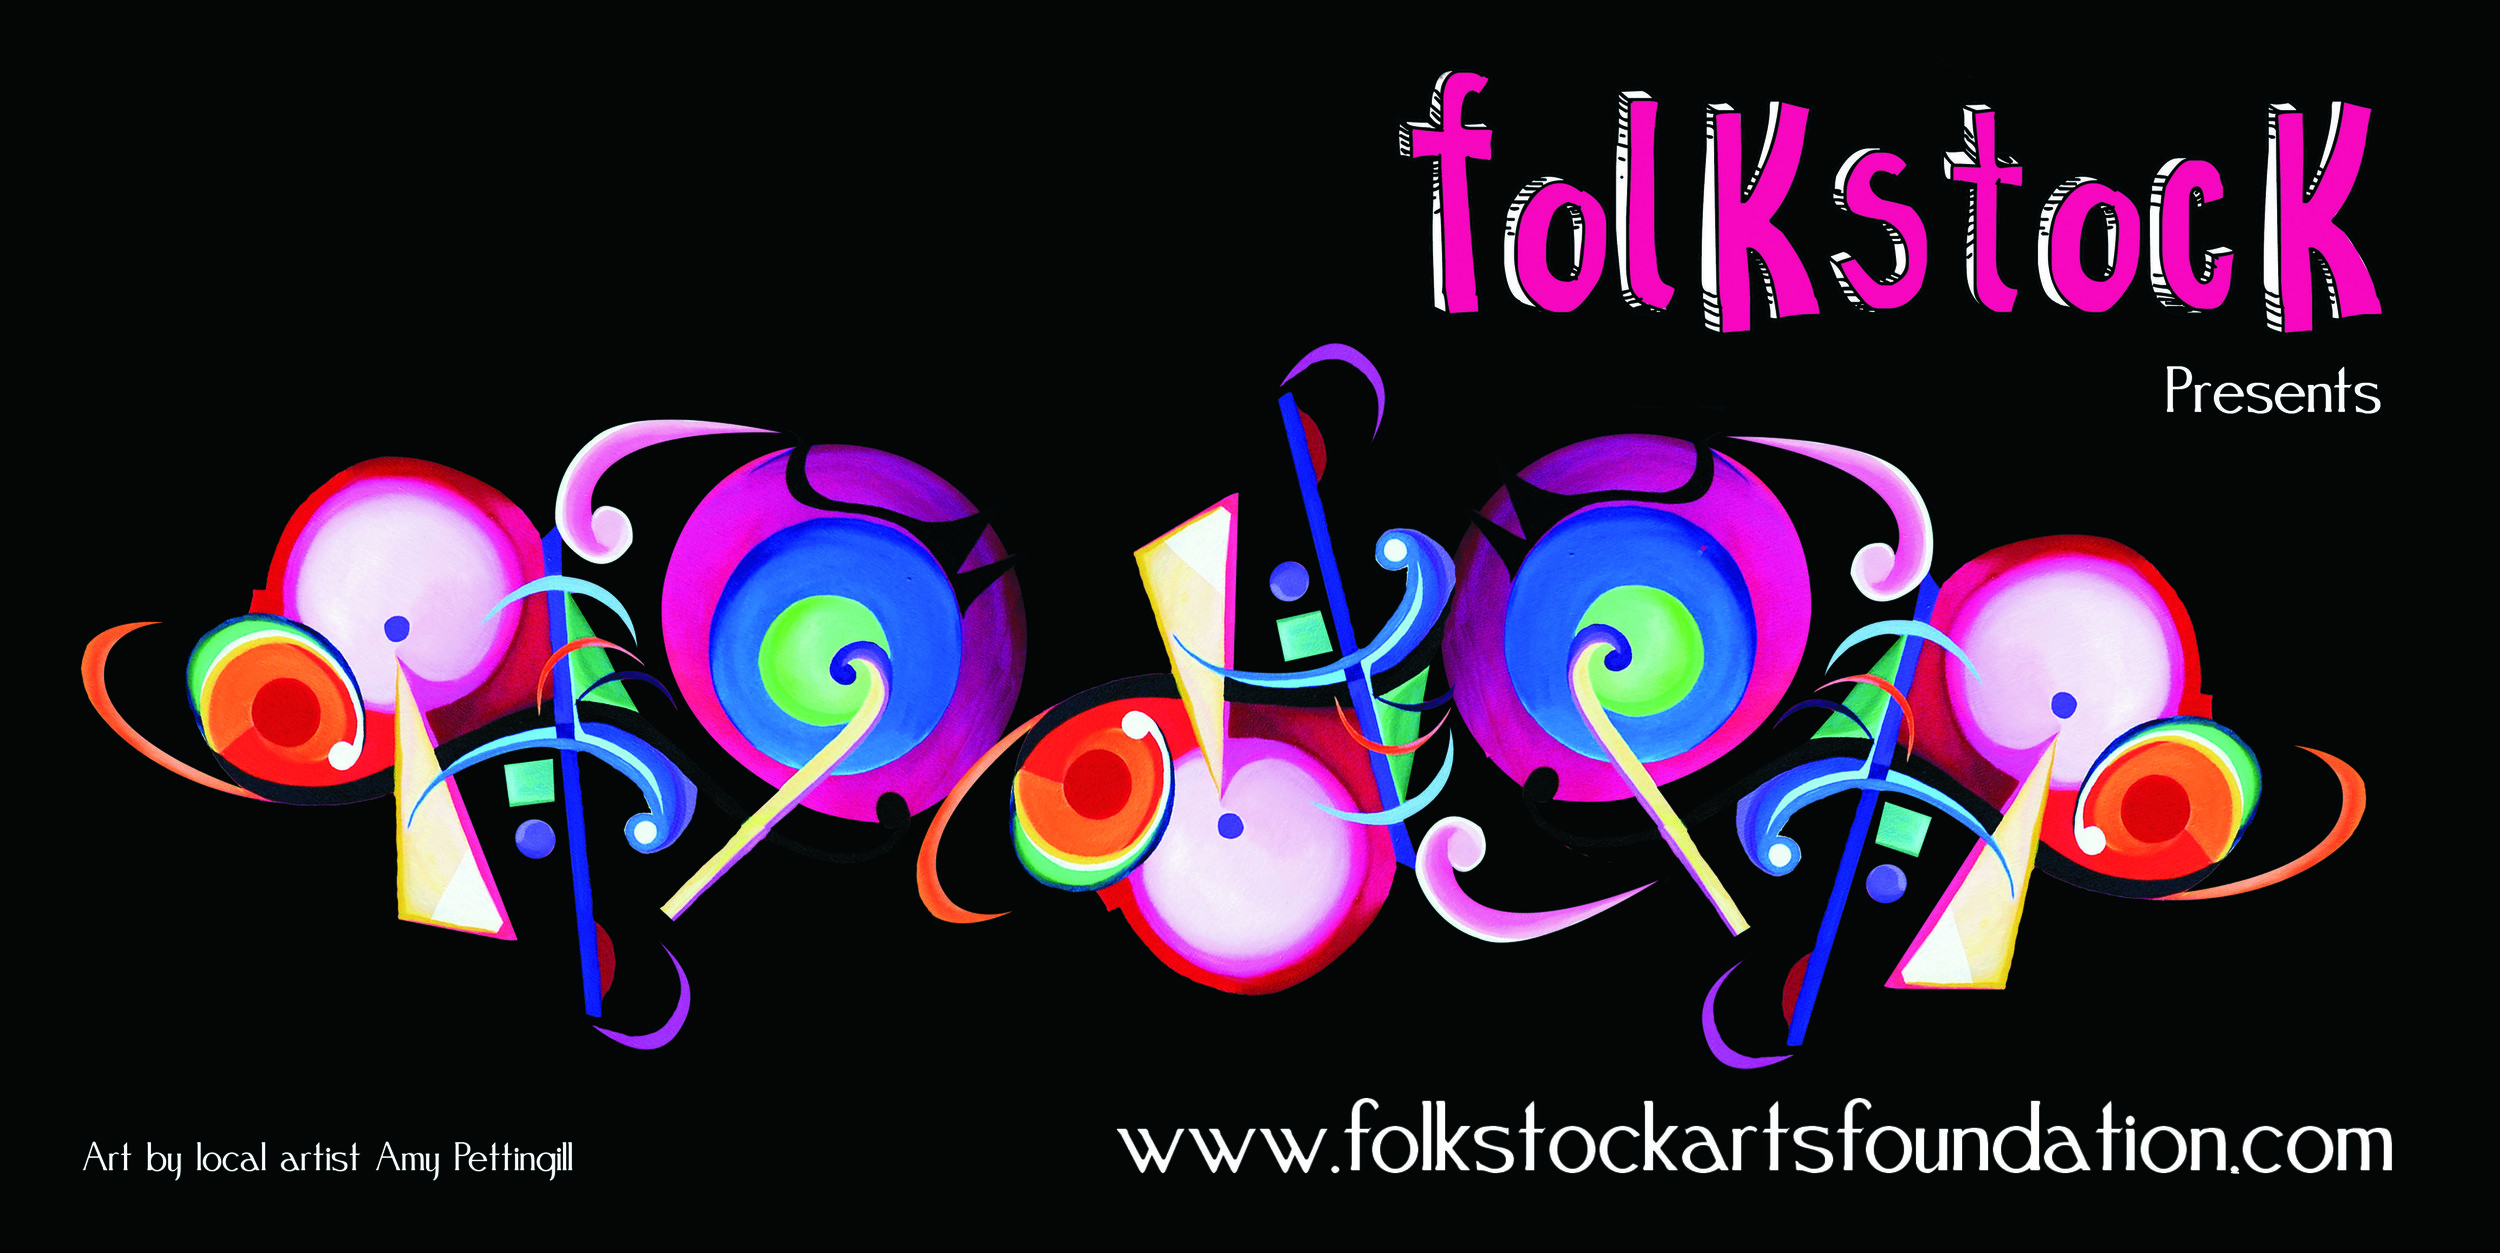 Folkstock Arts Foundation